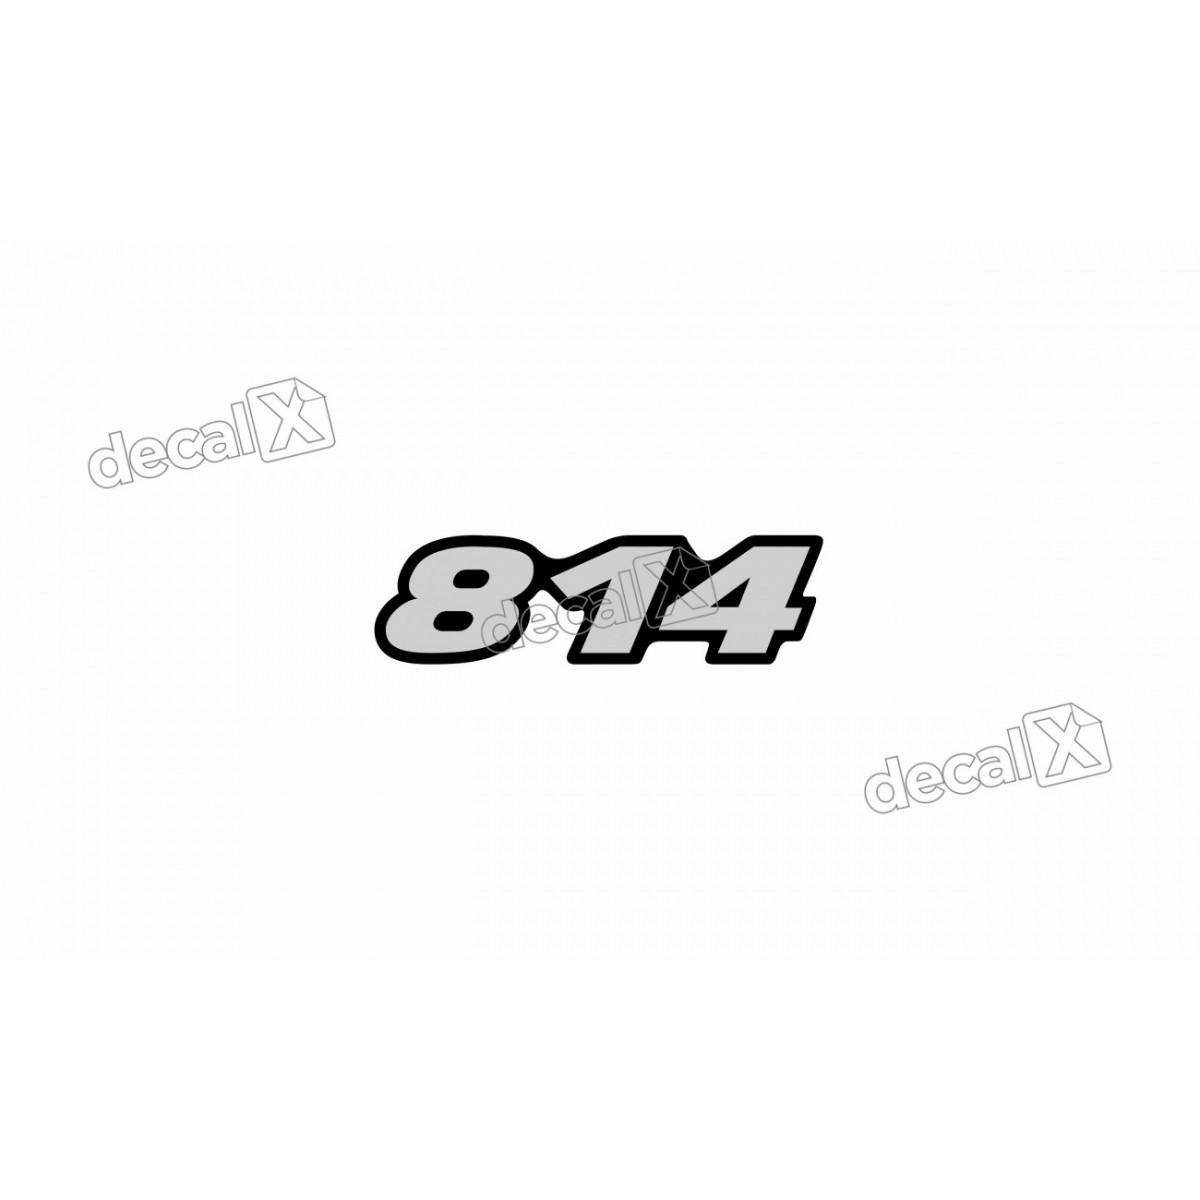 Adesivo Emblema Resinado Mercedes 814 Cm10 Decalx